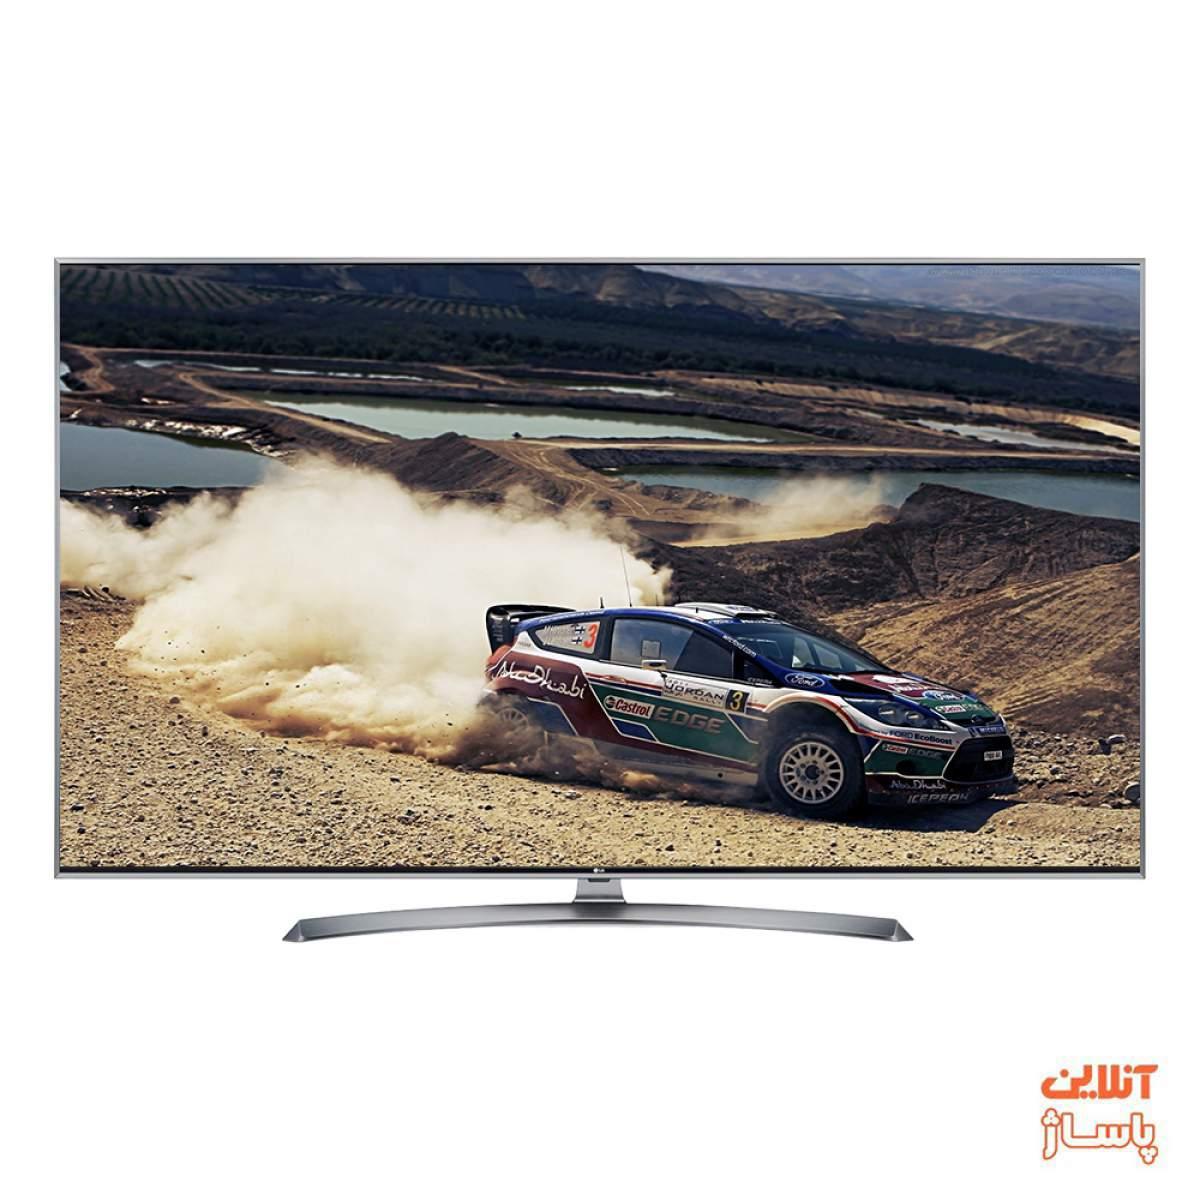 تلویزیون ال ای دی هوشمند ال جی مدل 49UJ75200GI-TB سایز 49 اینچ